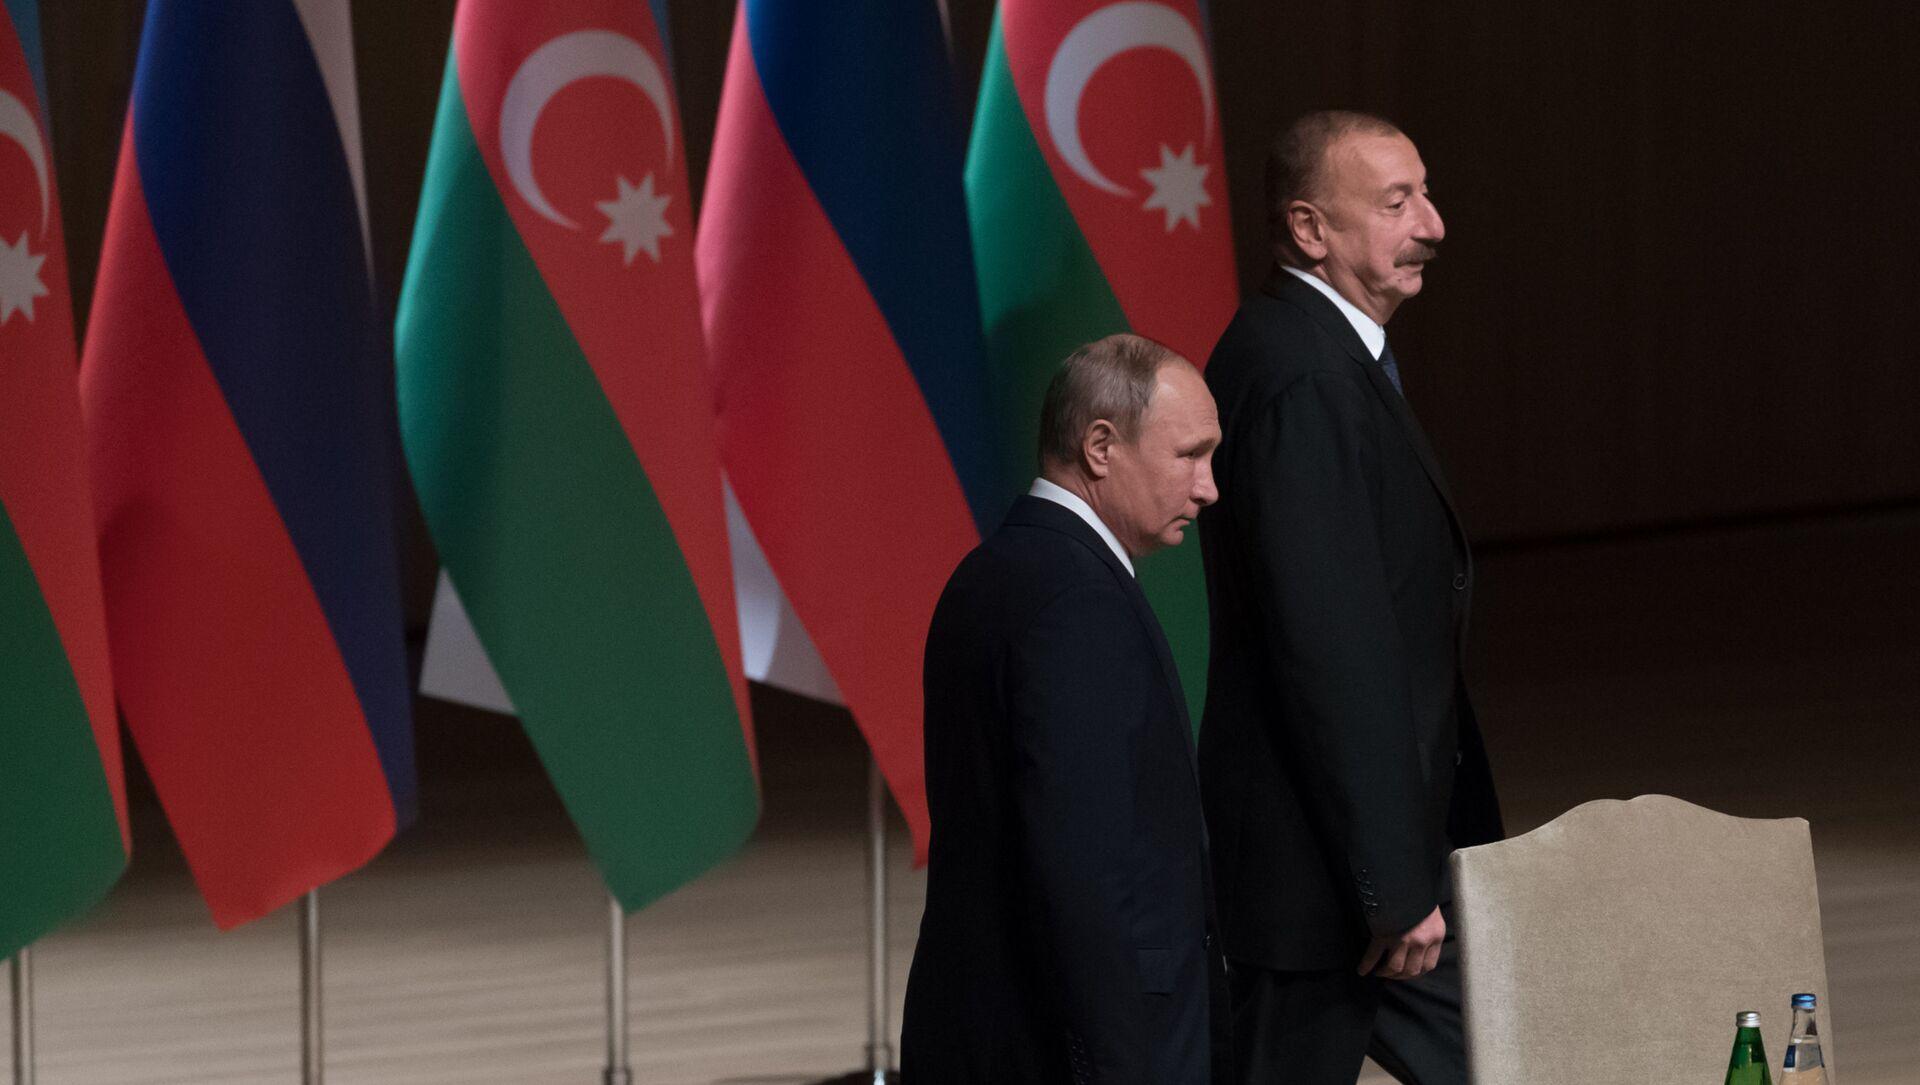 Президент РФ Владимир Путин и президент Азербайджана Ильхам Алиев - Sputnik Azərbaycan, 1920, 15.08.2021